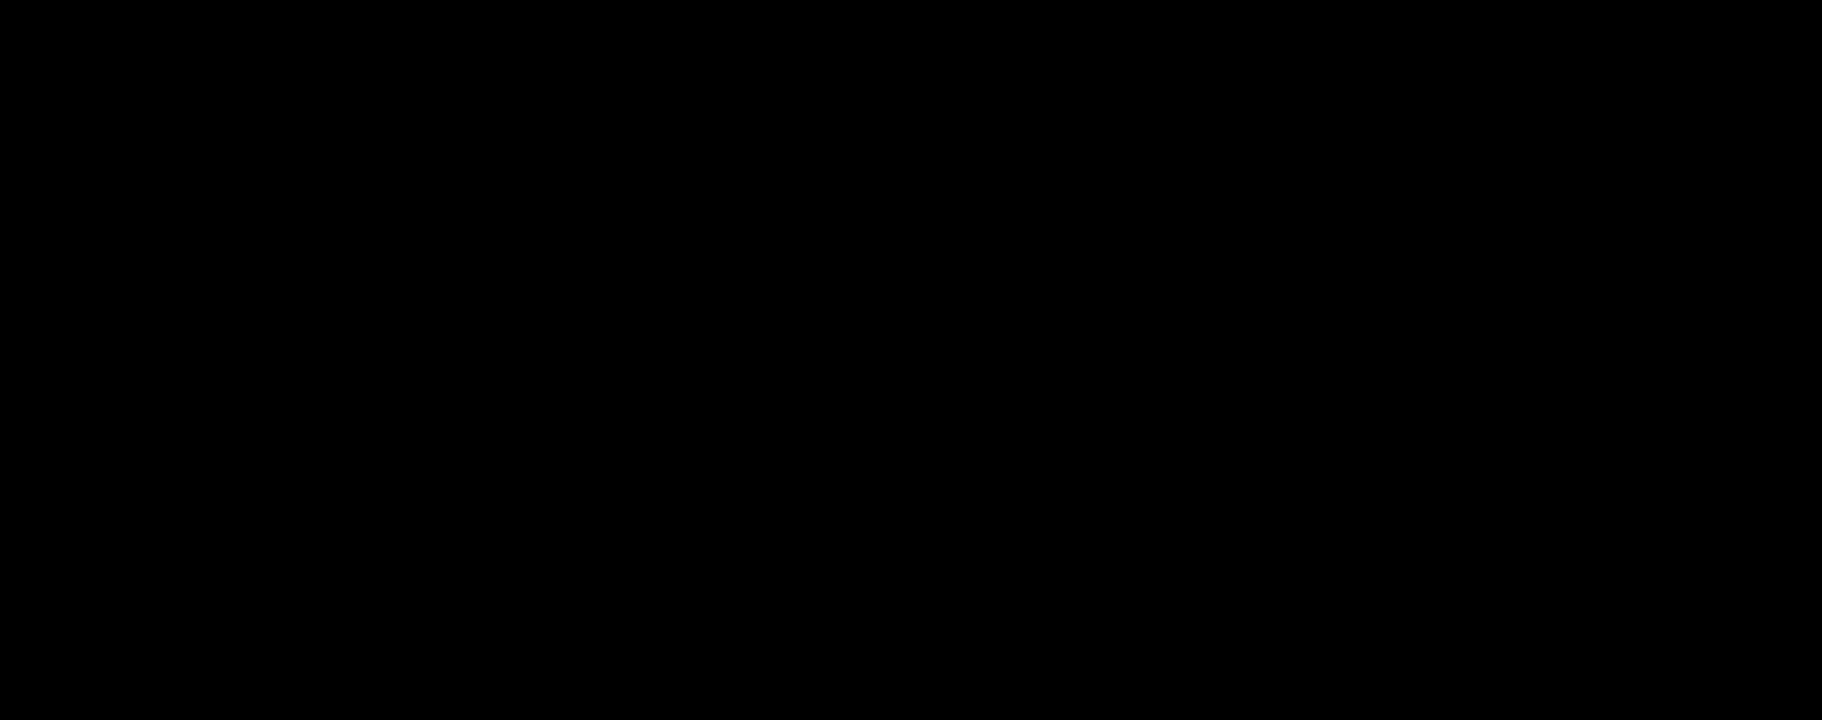 TITAN GPS black